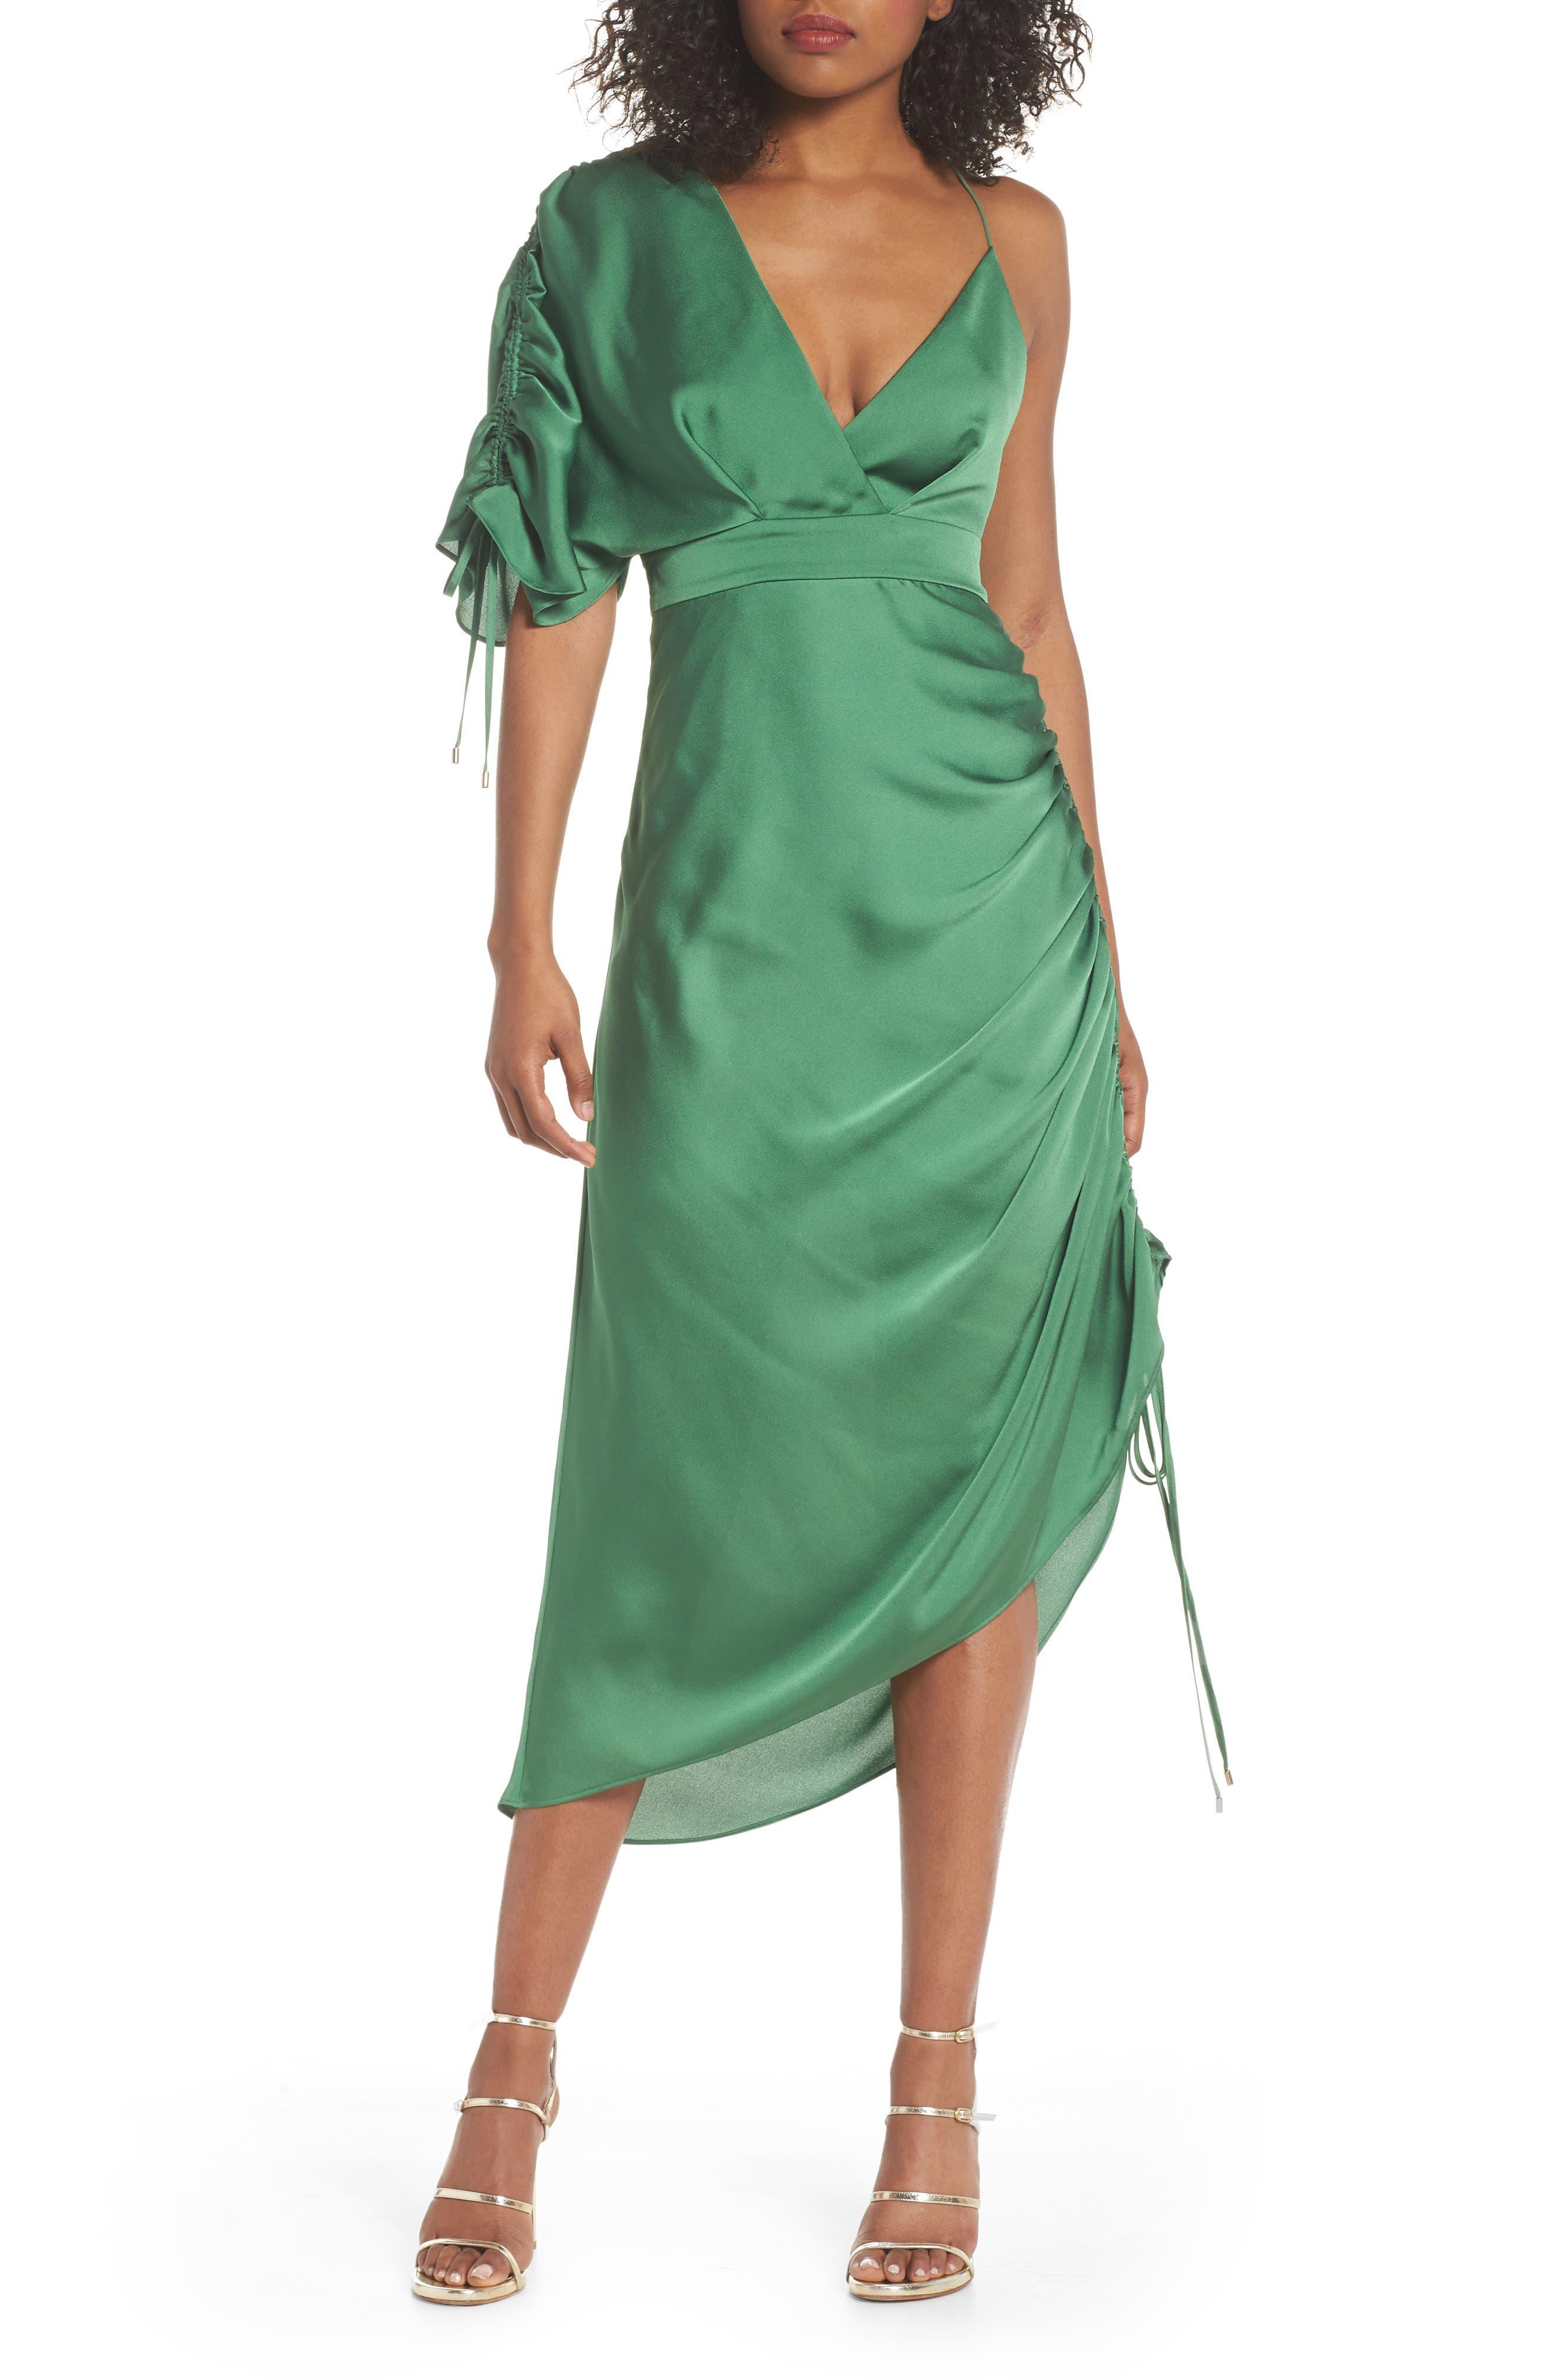 I've Got You Asymmetrical Satin Dress,                             Main thumbnail 1, color,                             310